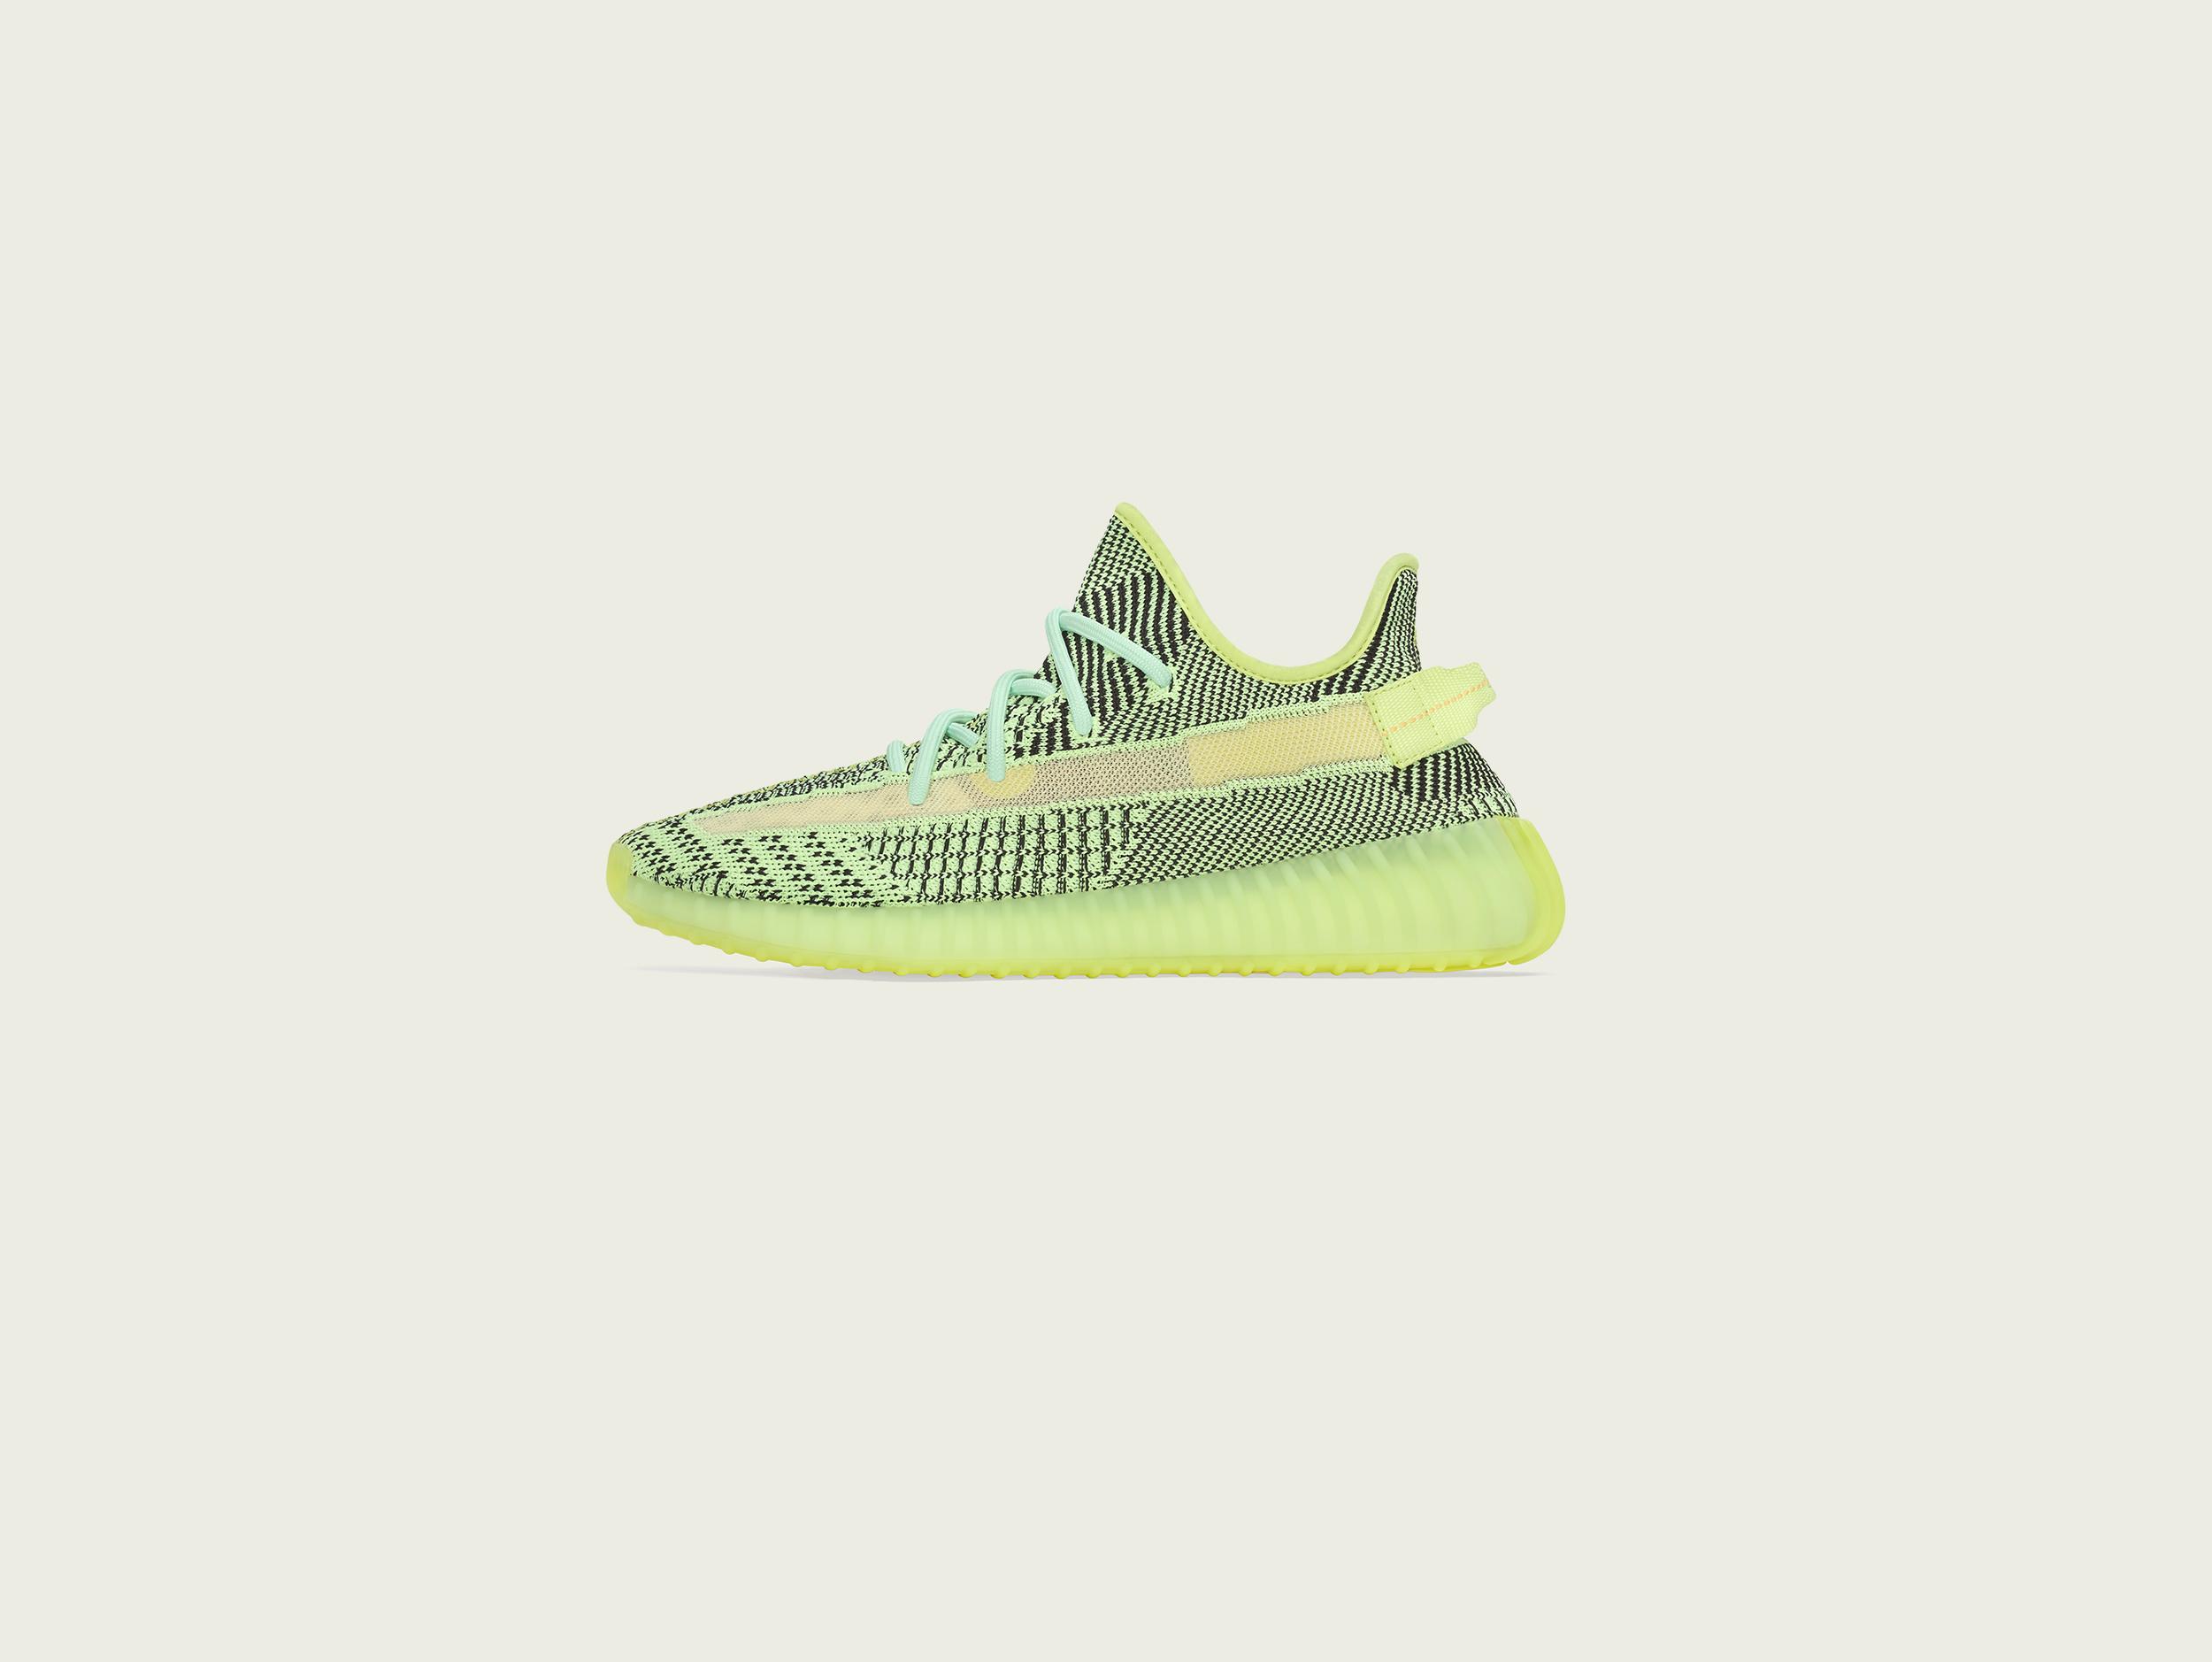 adidas + KANYE WEST、YEEZY BOOST 350 V2新色発売